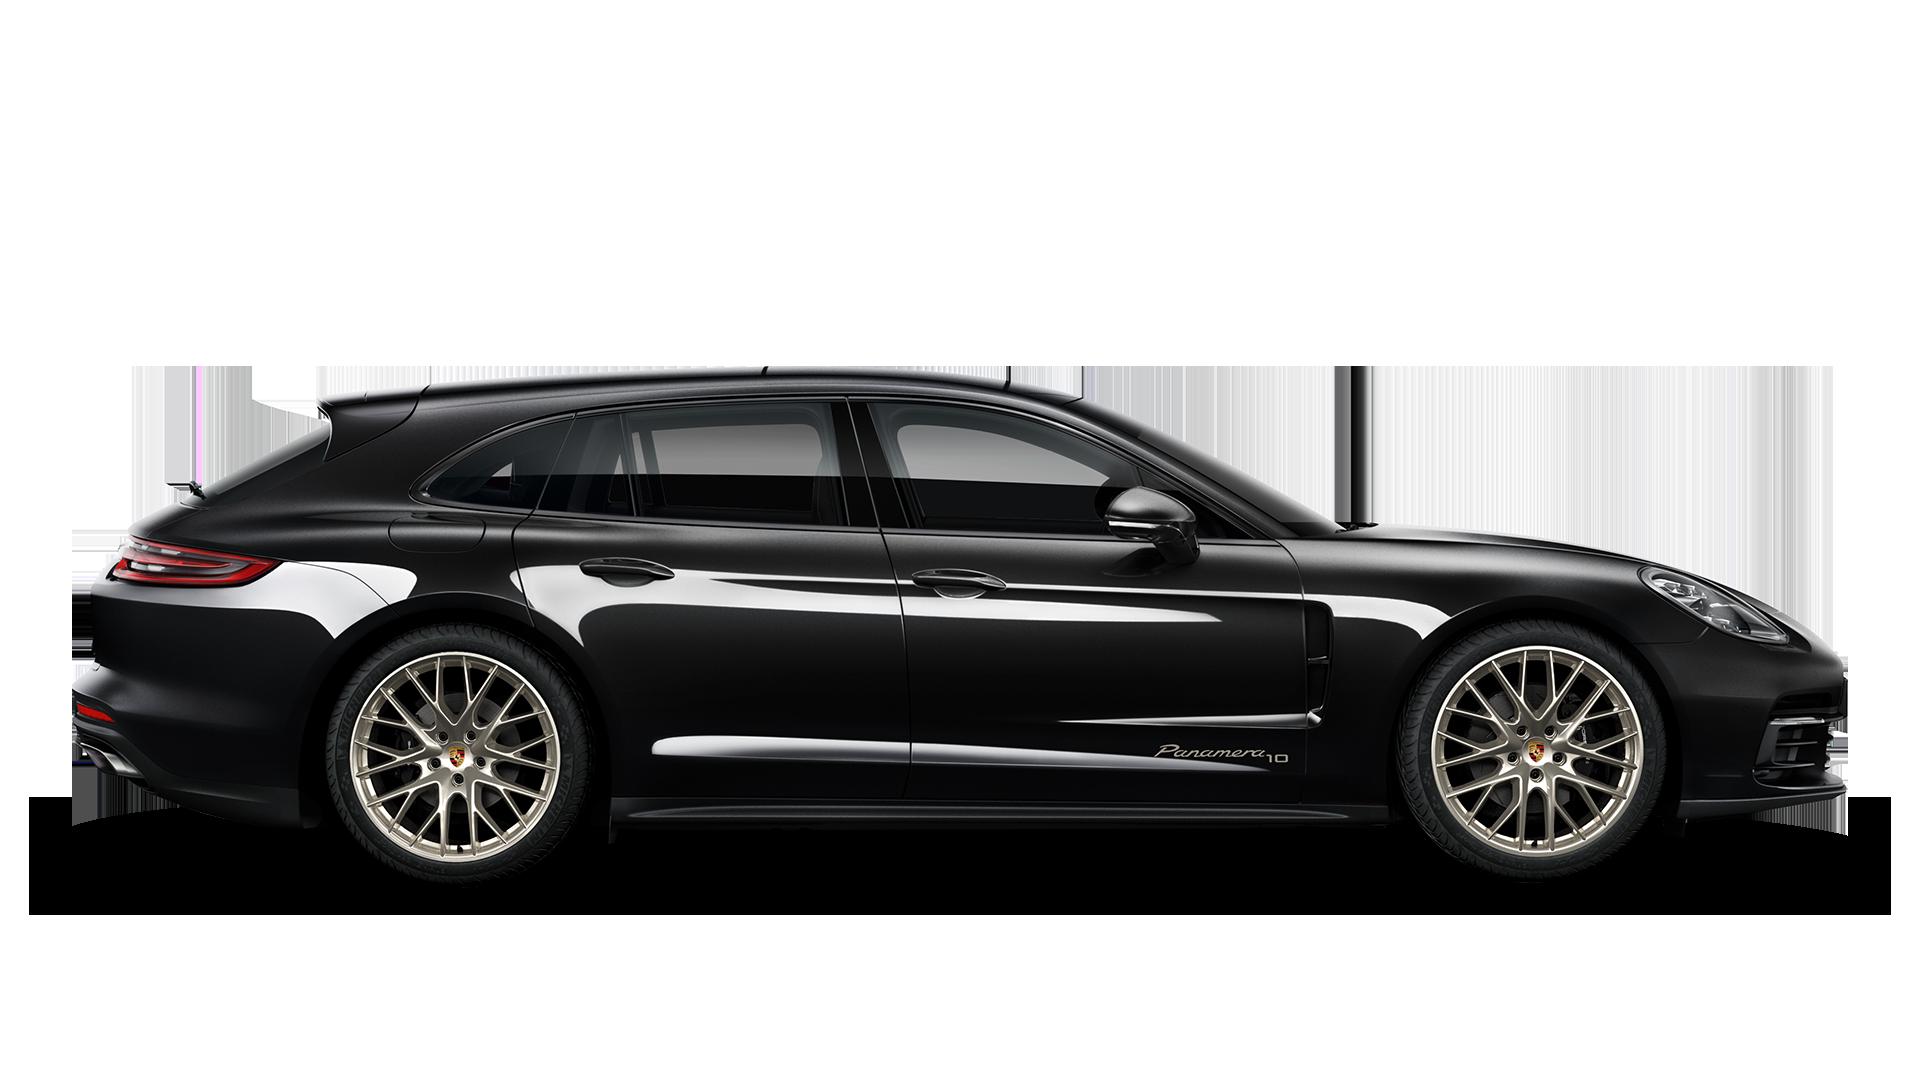 Porsche Panamera 4 Sport Turismo 10 Years Edition